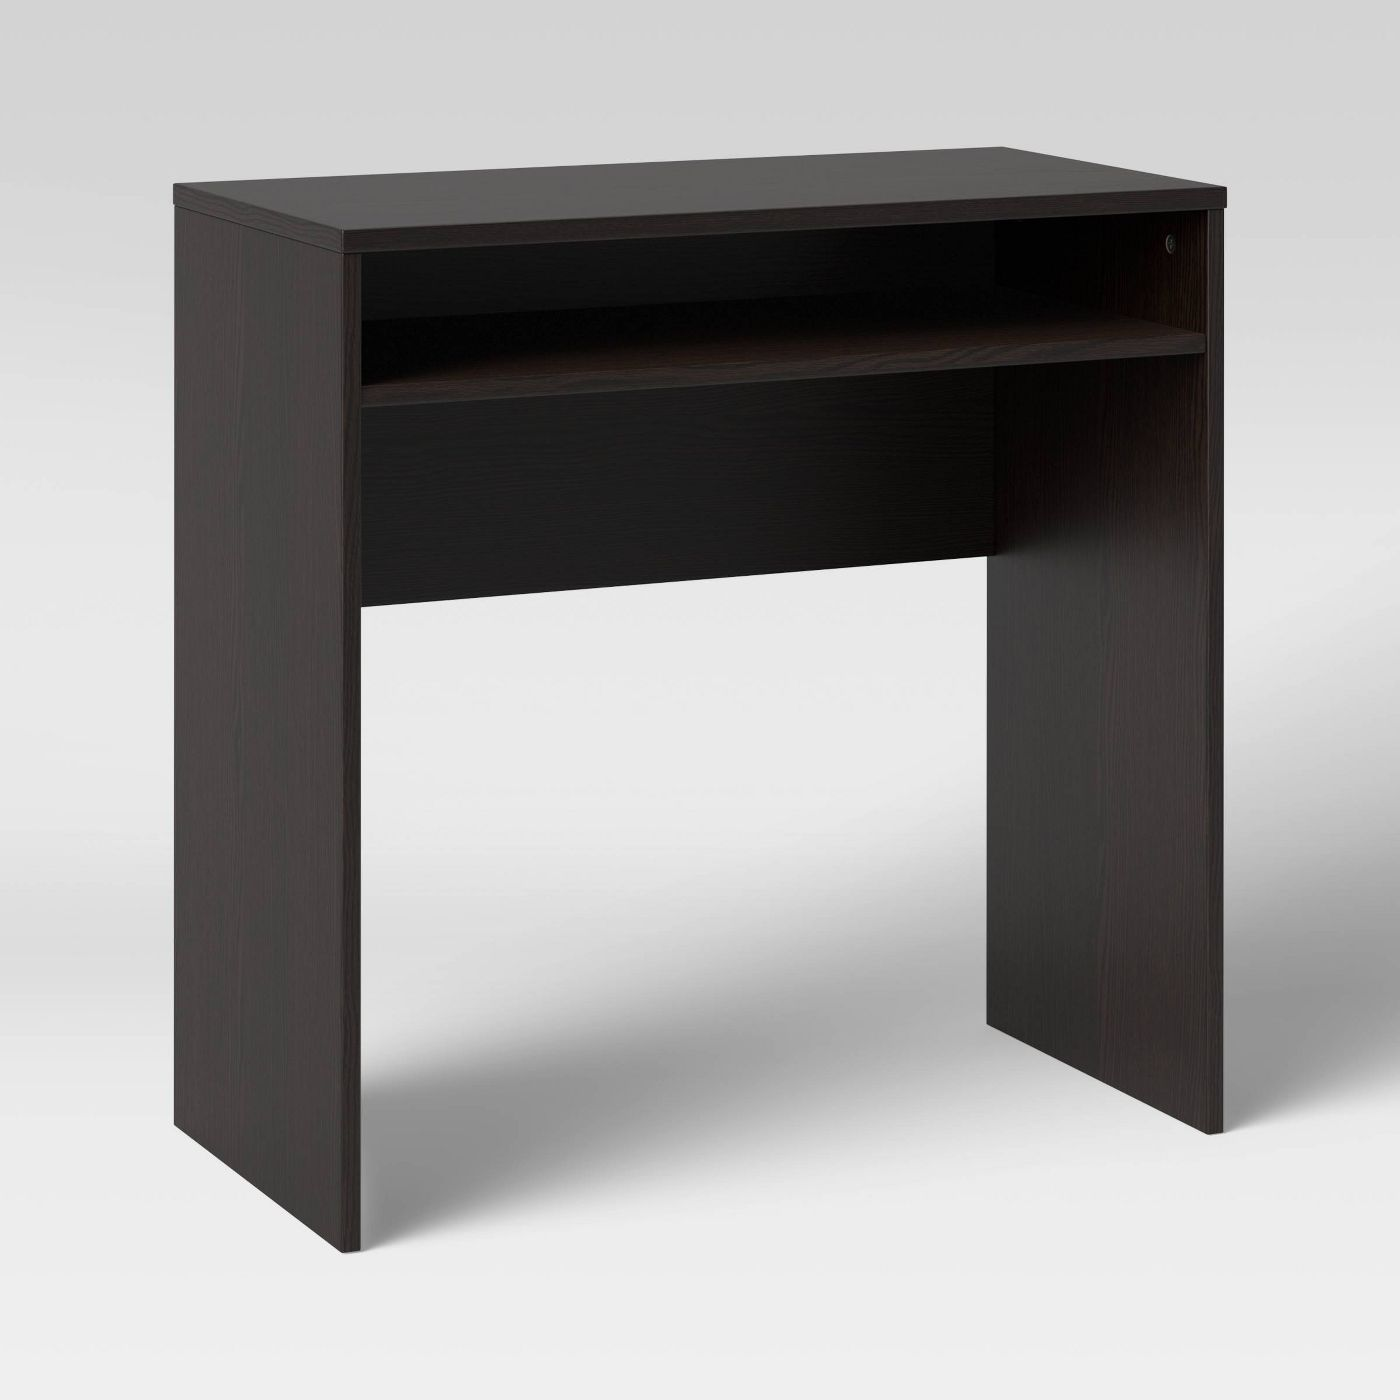 Room Essentials Compact Desk